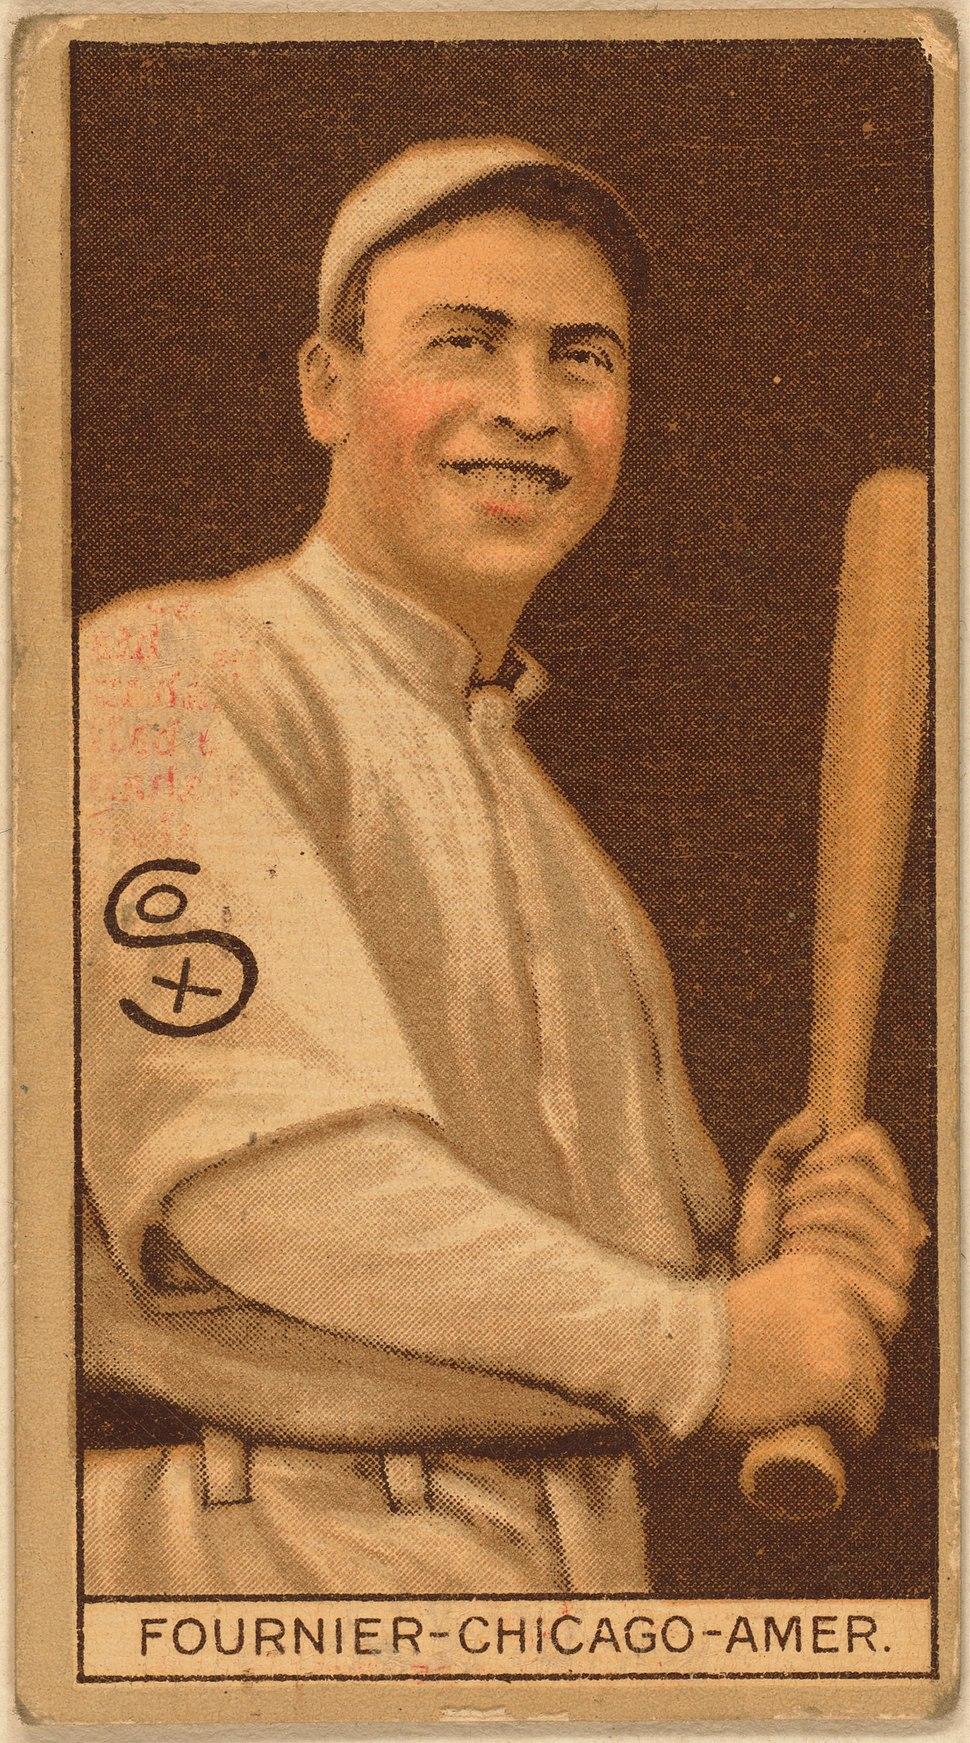 Jack Fournier baseball card